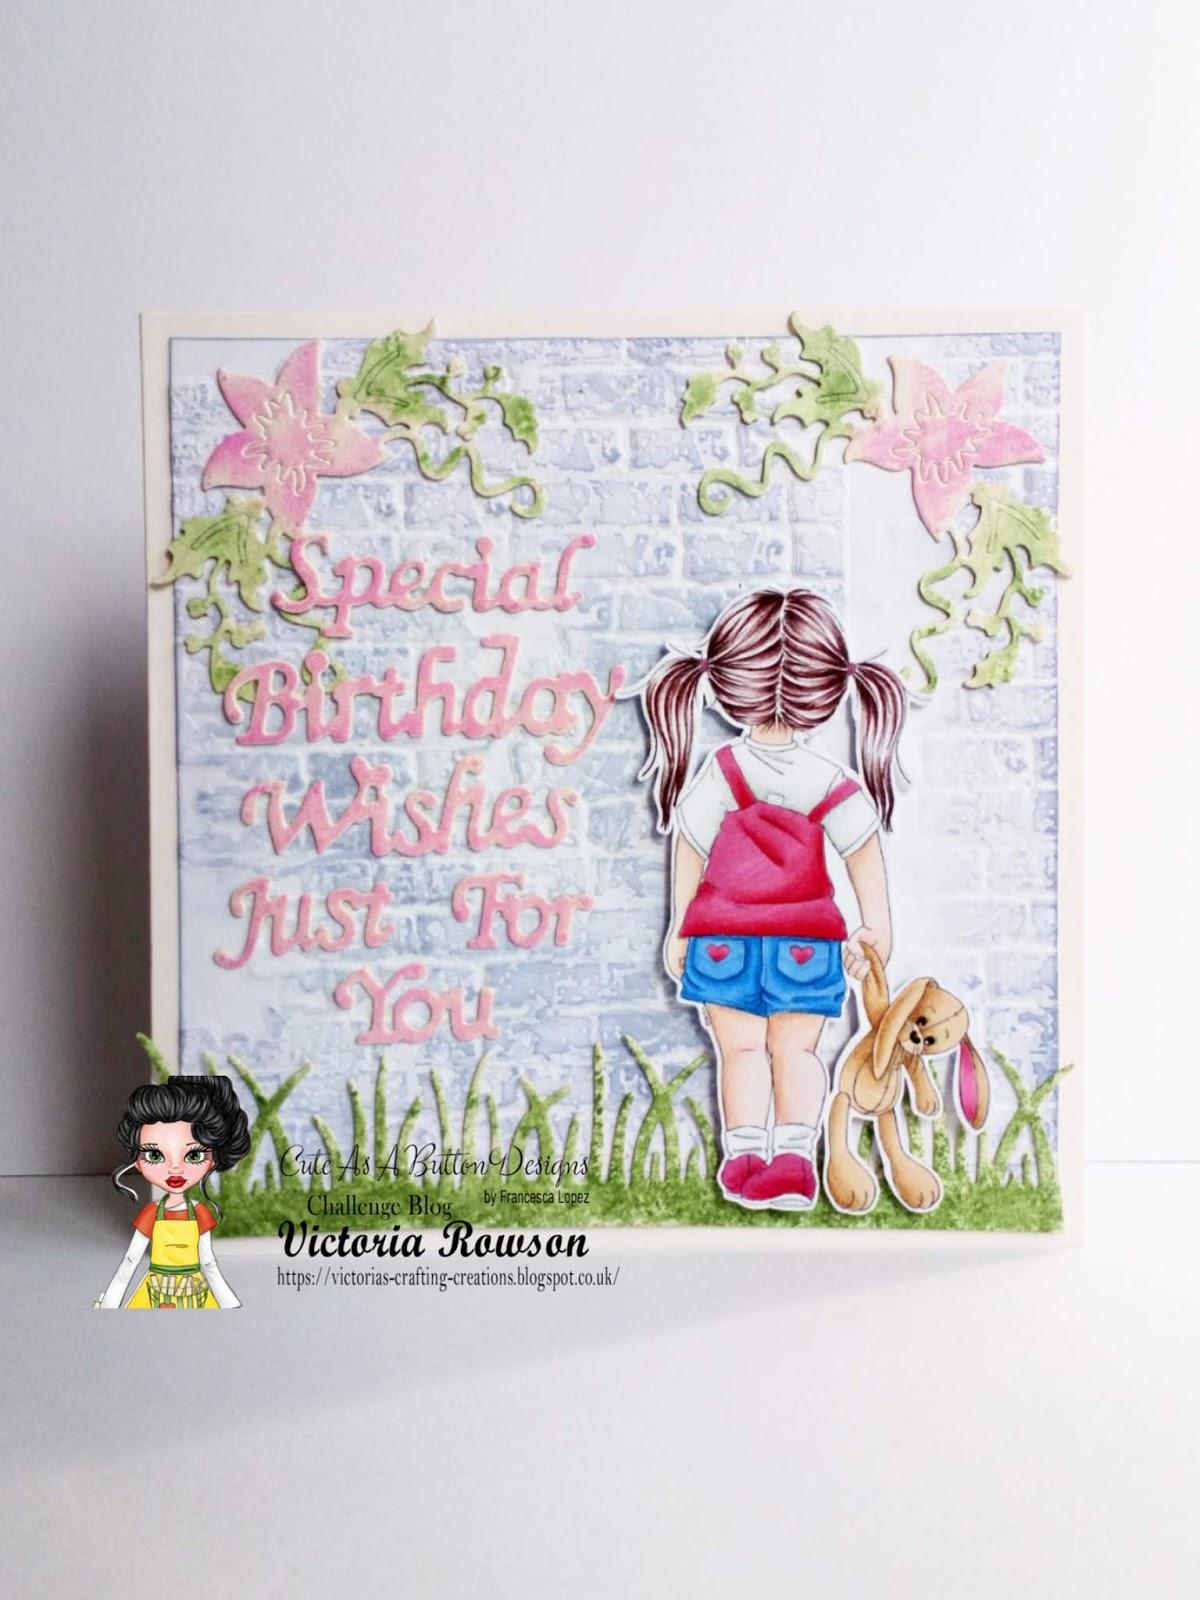 Incredible Victorias Crafting Creations Caab Bunny Walk Special Birthday Personalised Birthday Cards Veneteletsinfo